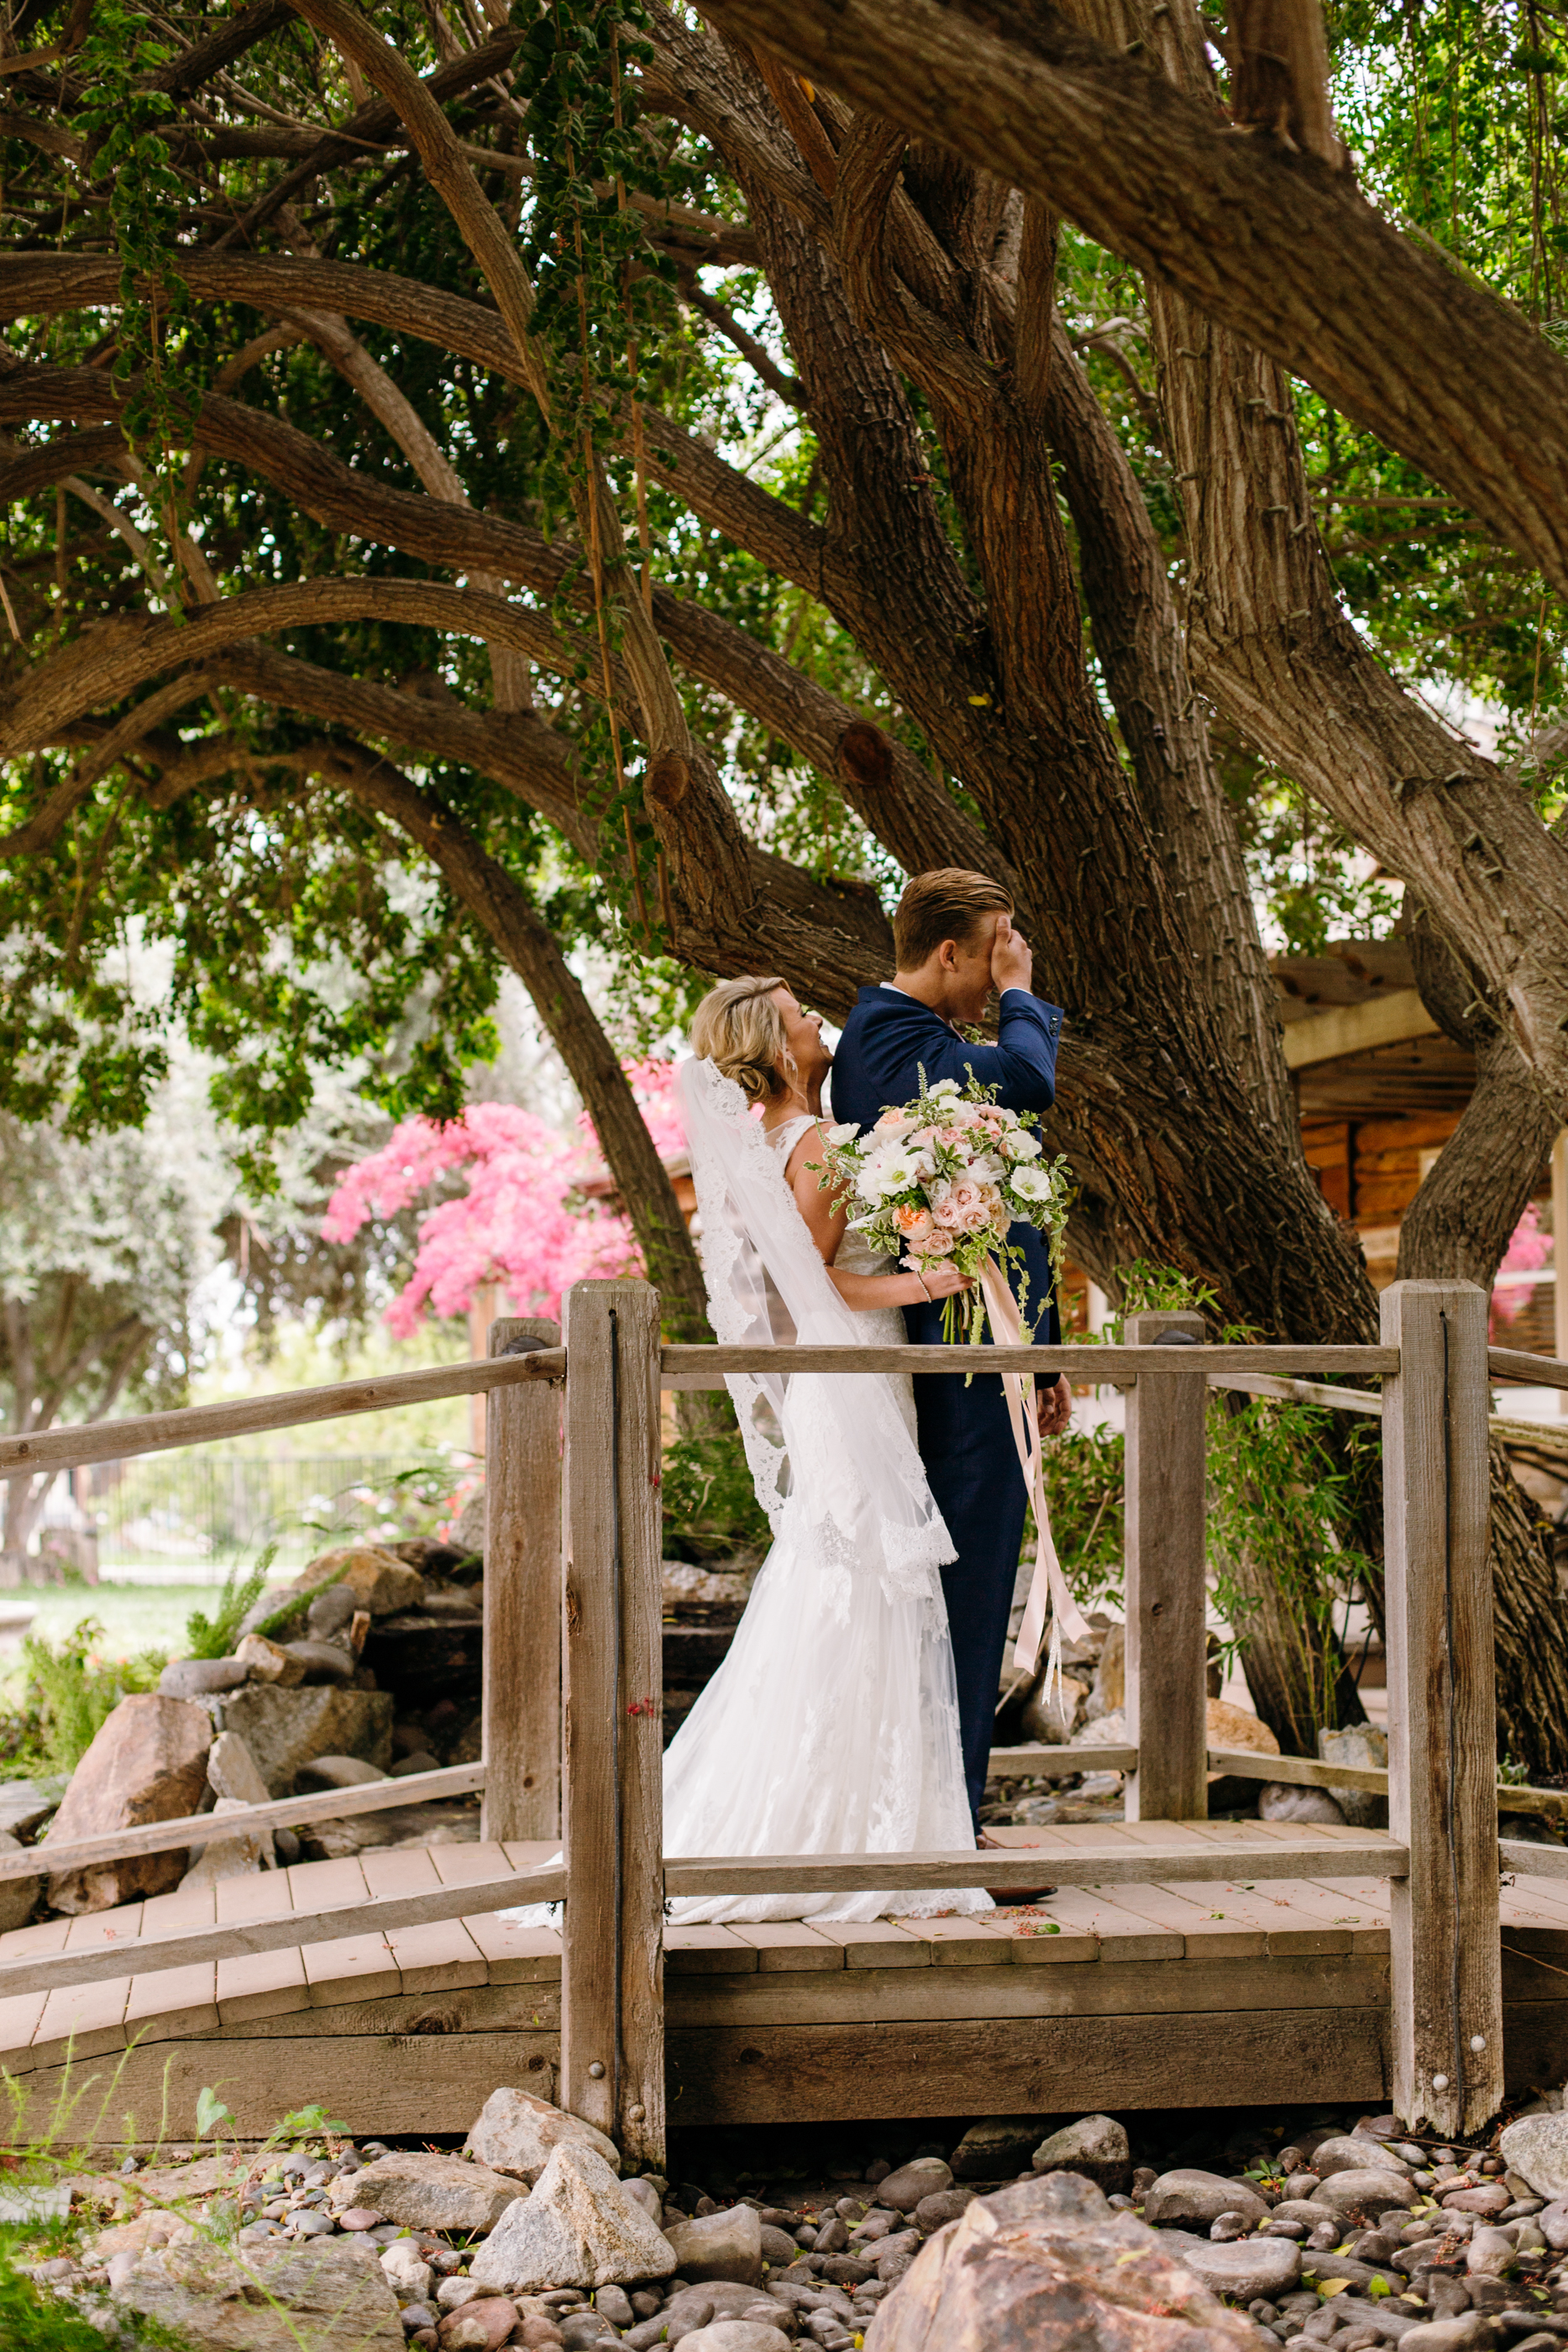 KaraNixonWeddings-LakeOakMeadows-Temecula-Wedding-15.jpg